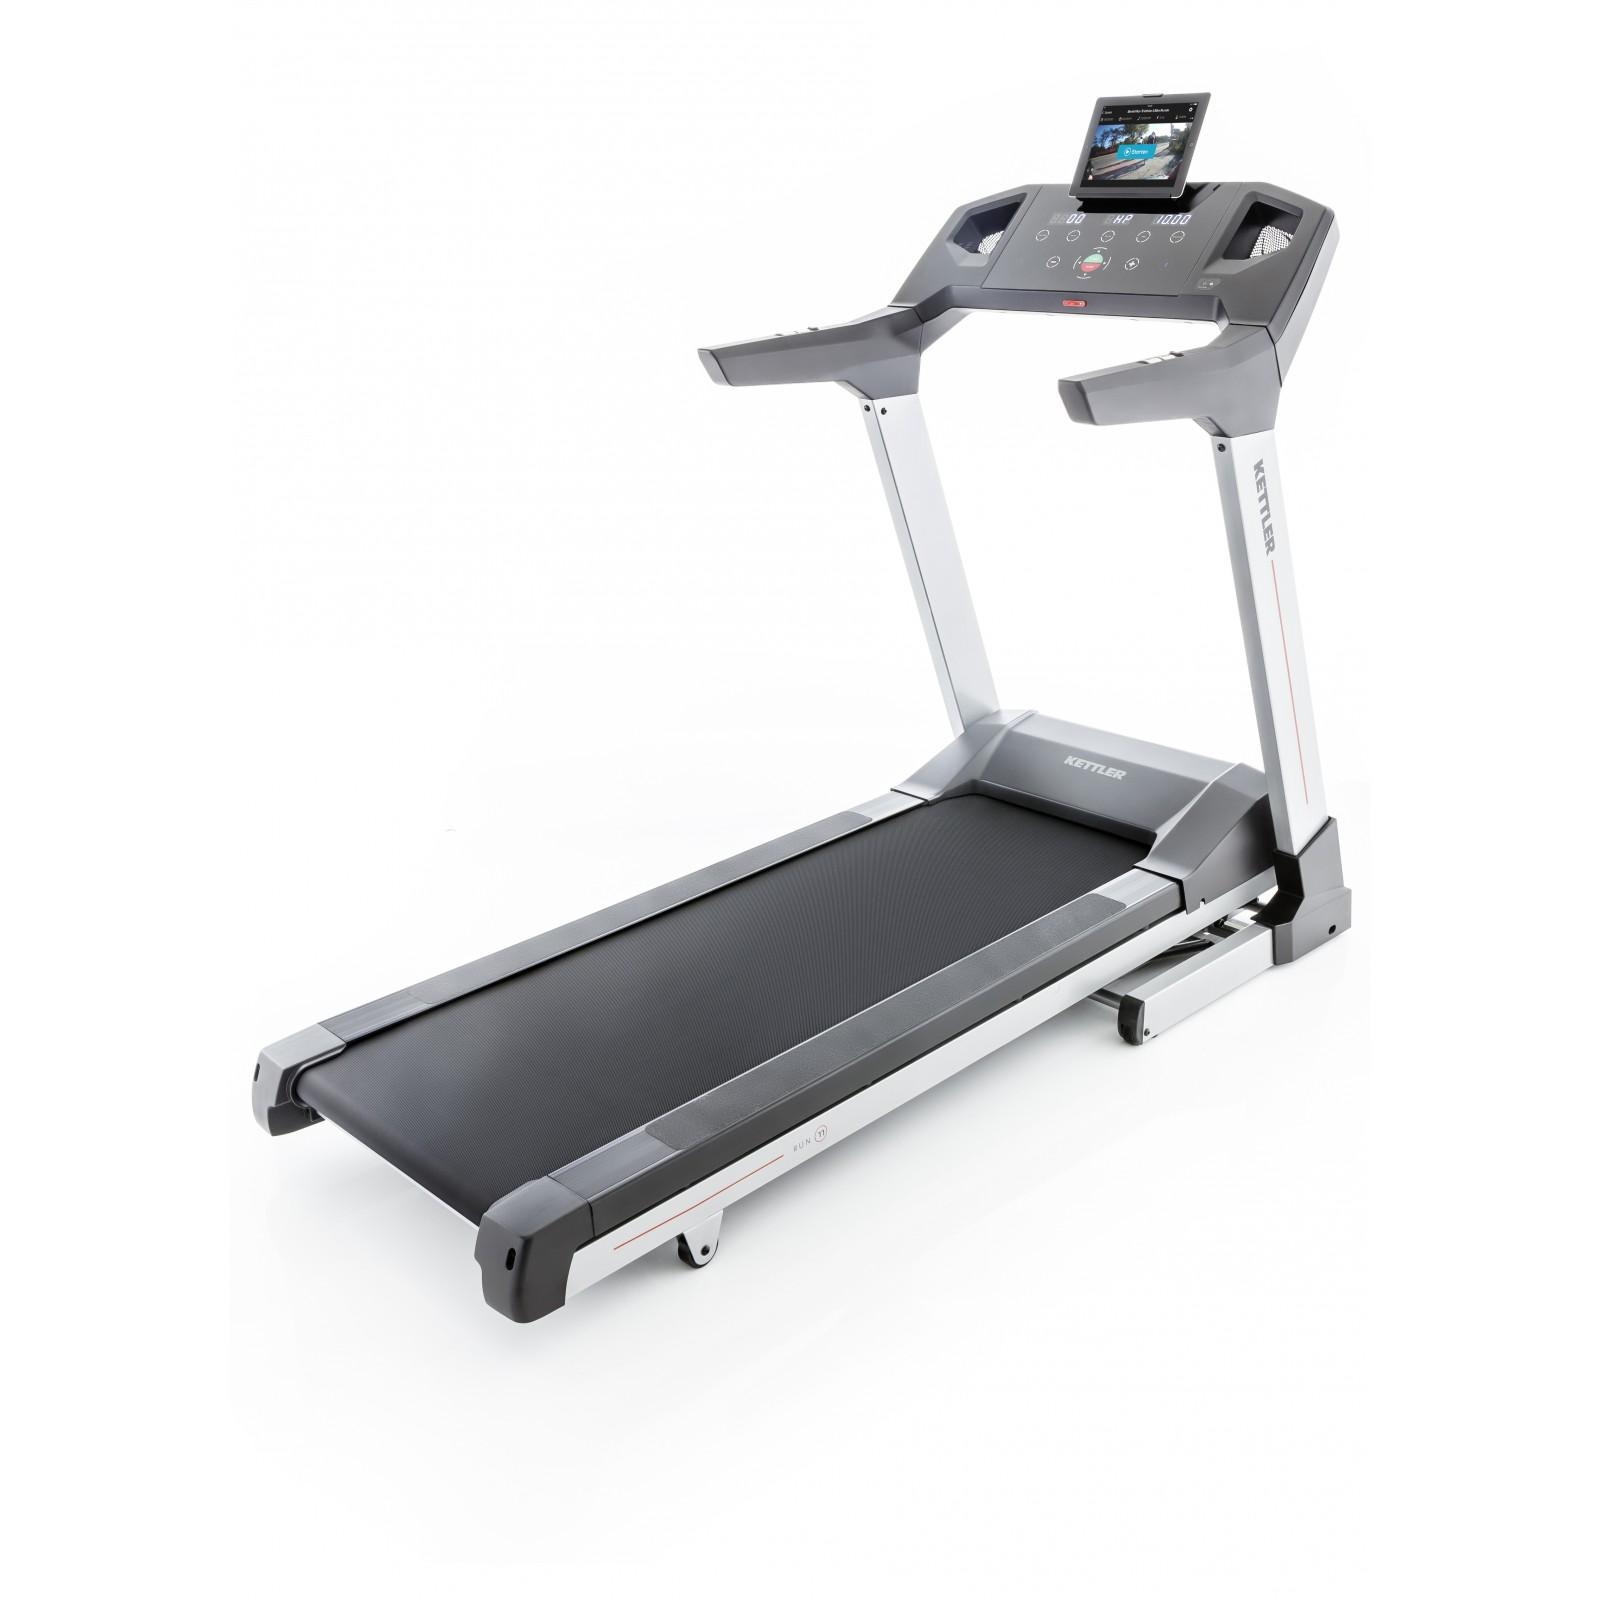 kettler treadmill run 11 europe 39 s no 1 for home fitness. Black Bedroom Furniture Sets. Home Design Ideas